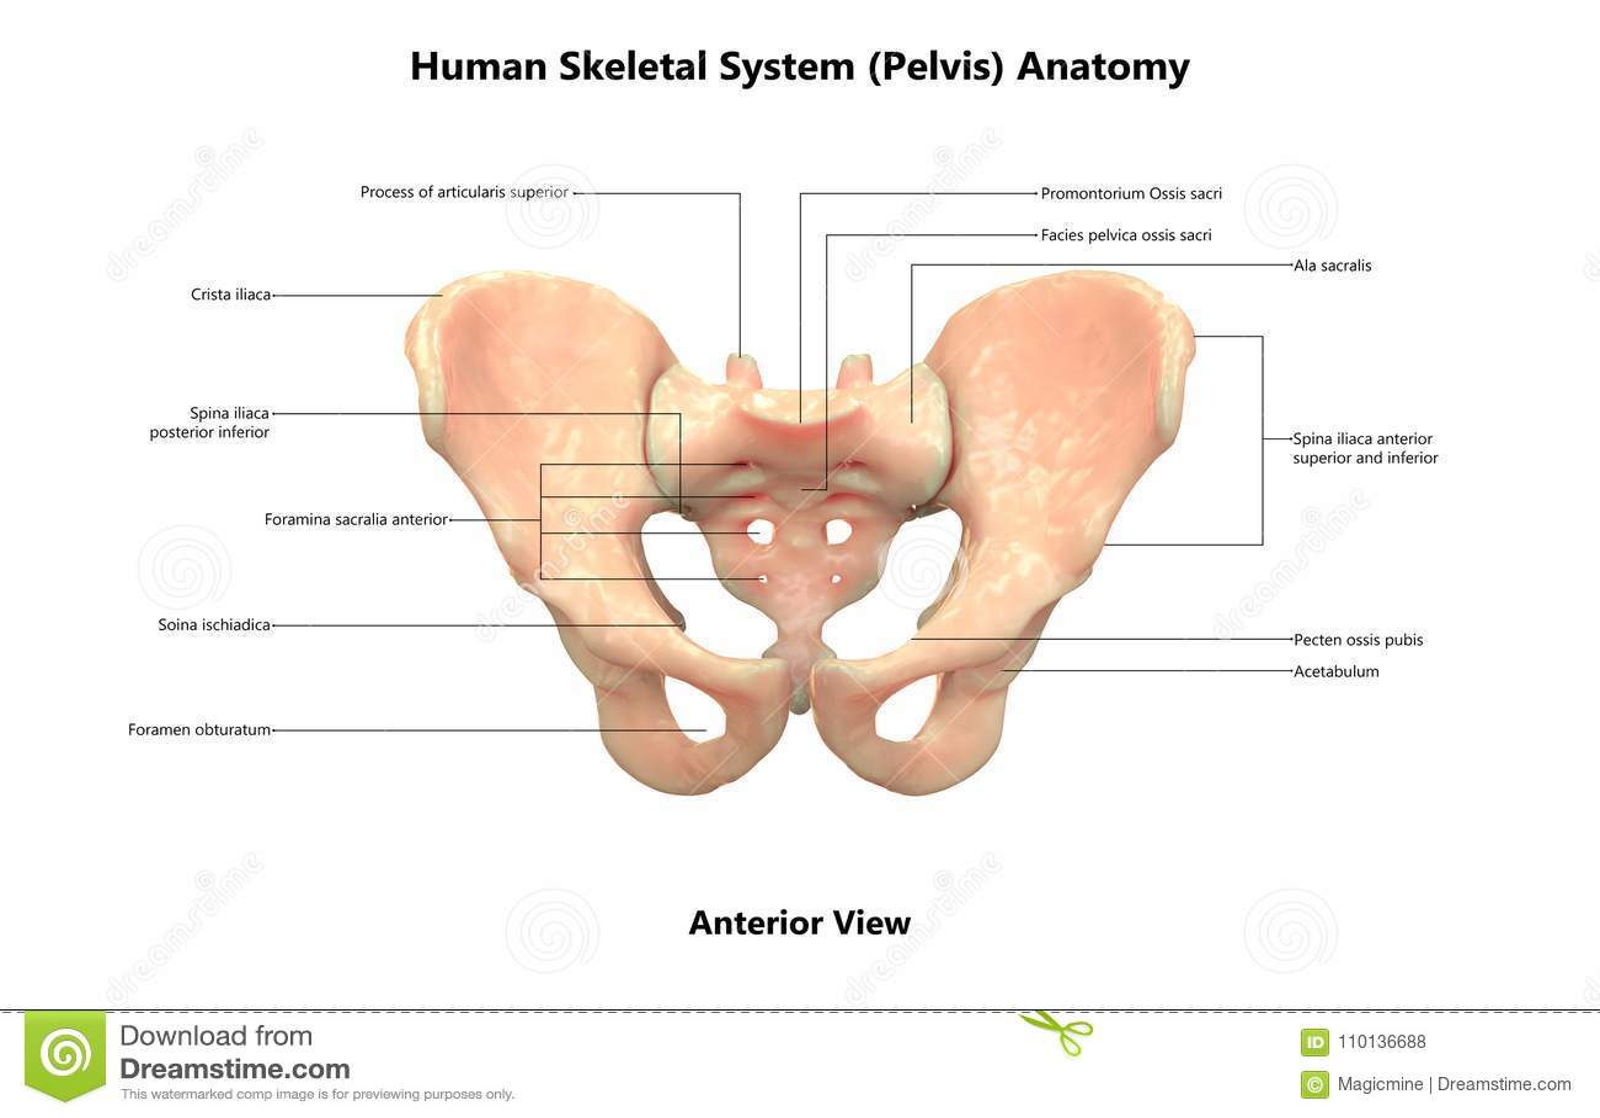 Human Body Skeleton System Pelvis Anterior View Anatomy Stock